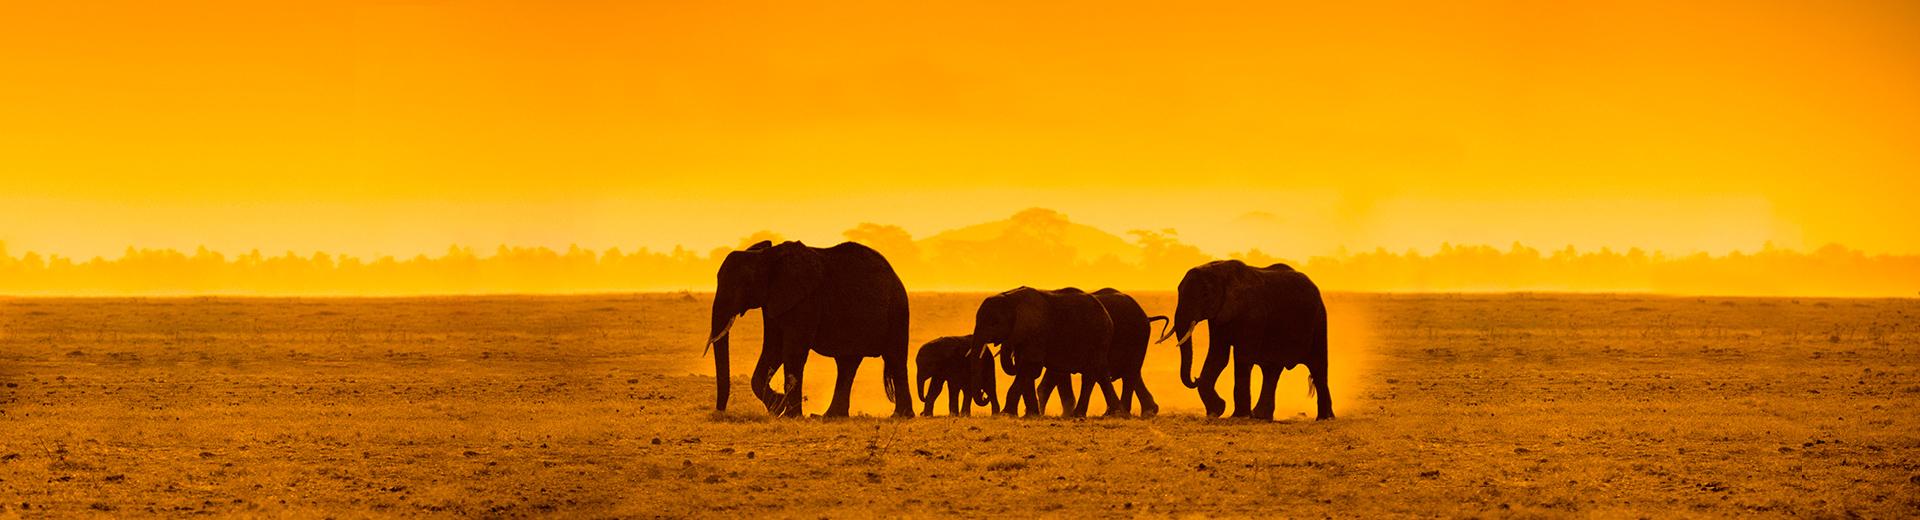 elephantsnotextedited